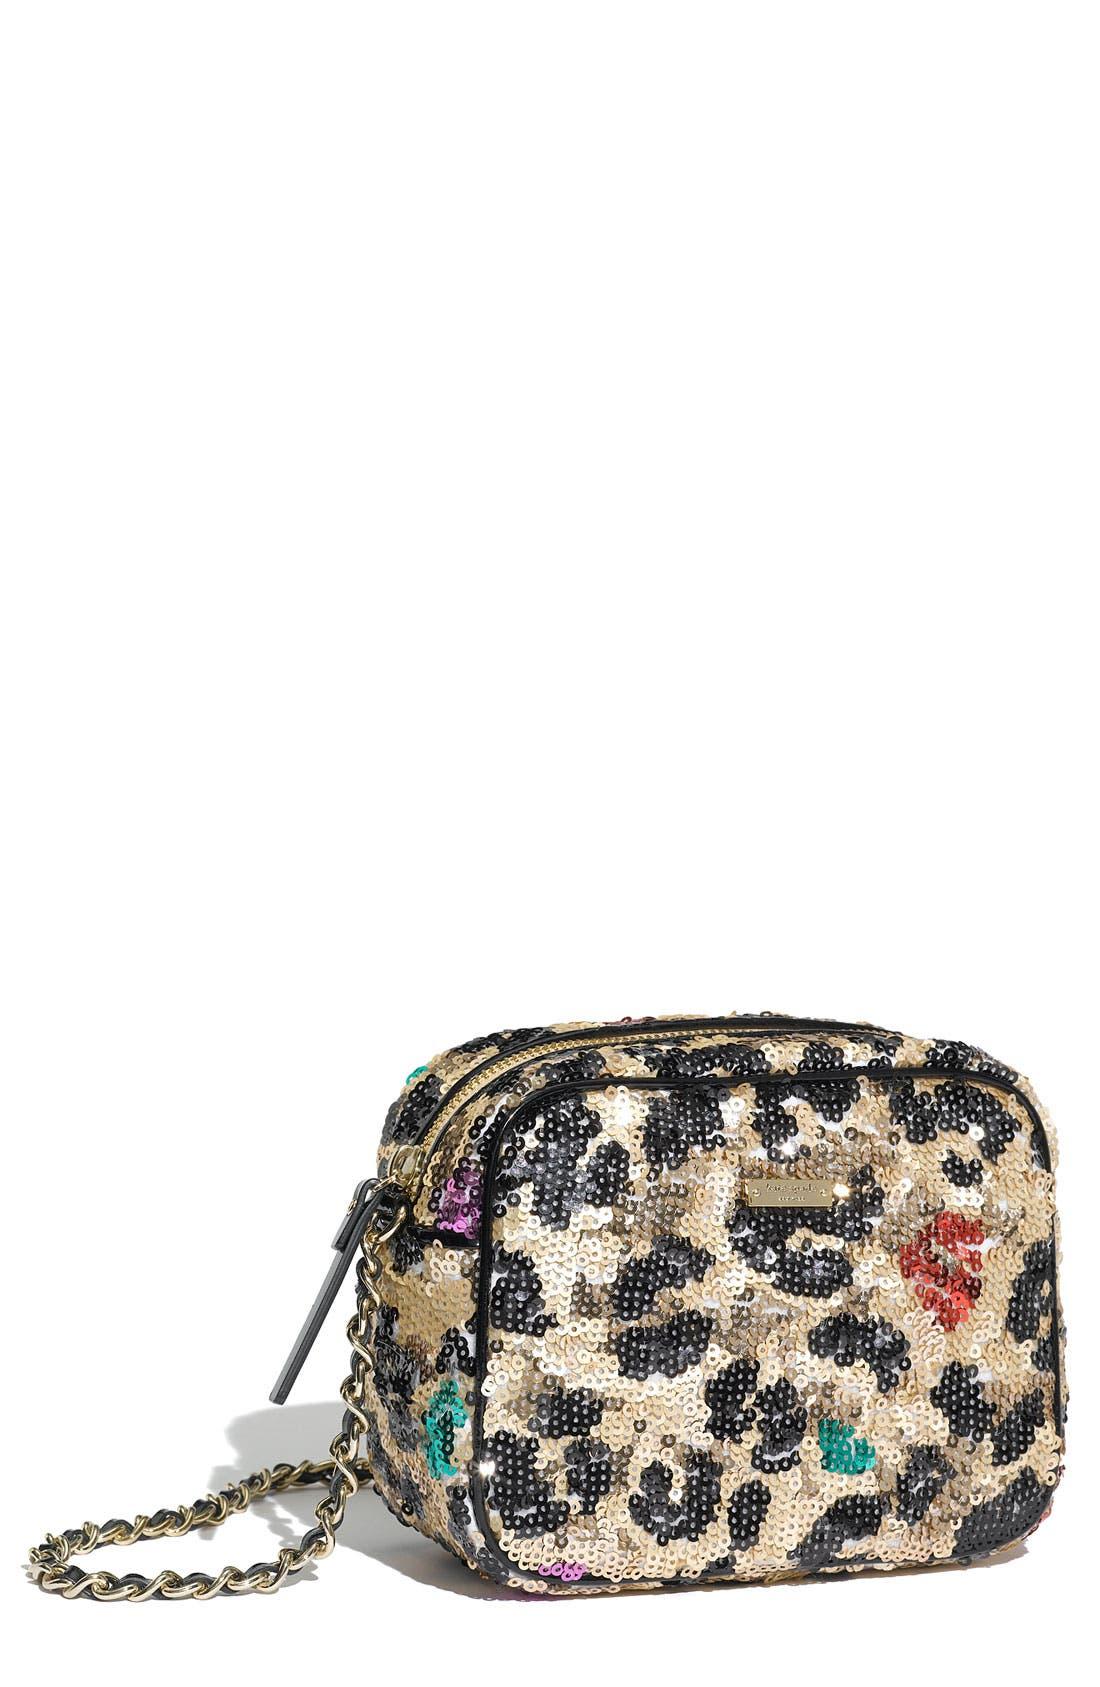 Alternate Image 1 Selected - kate spade new york 'lauralee' sequin crossbody bag